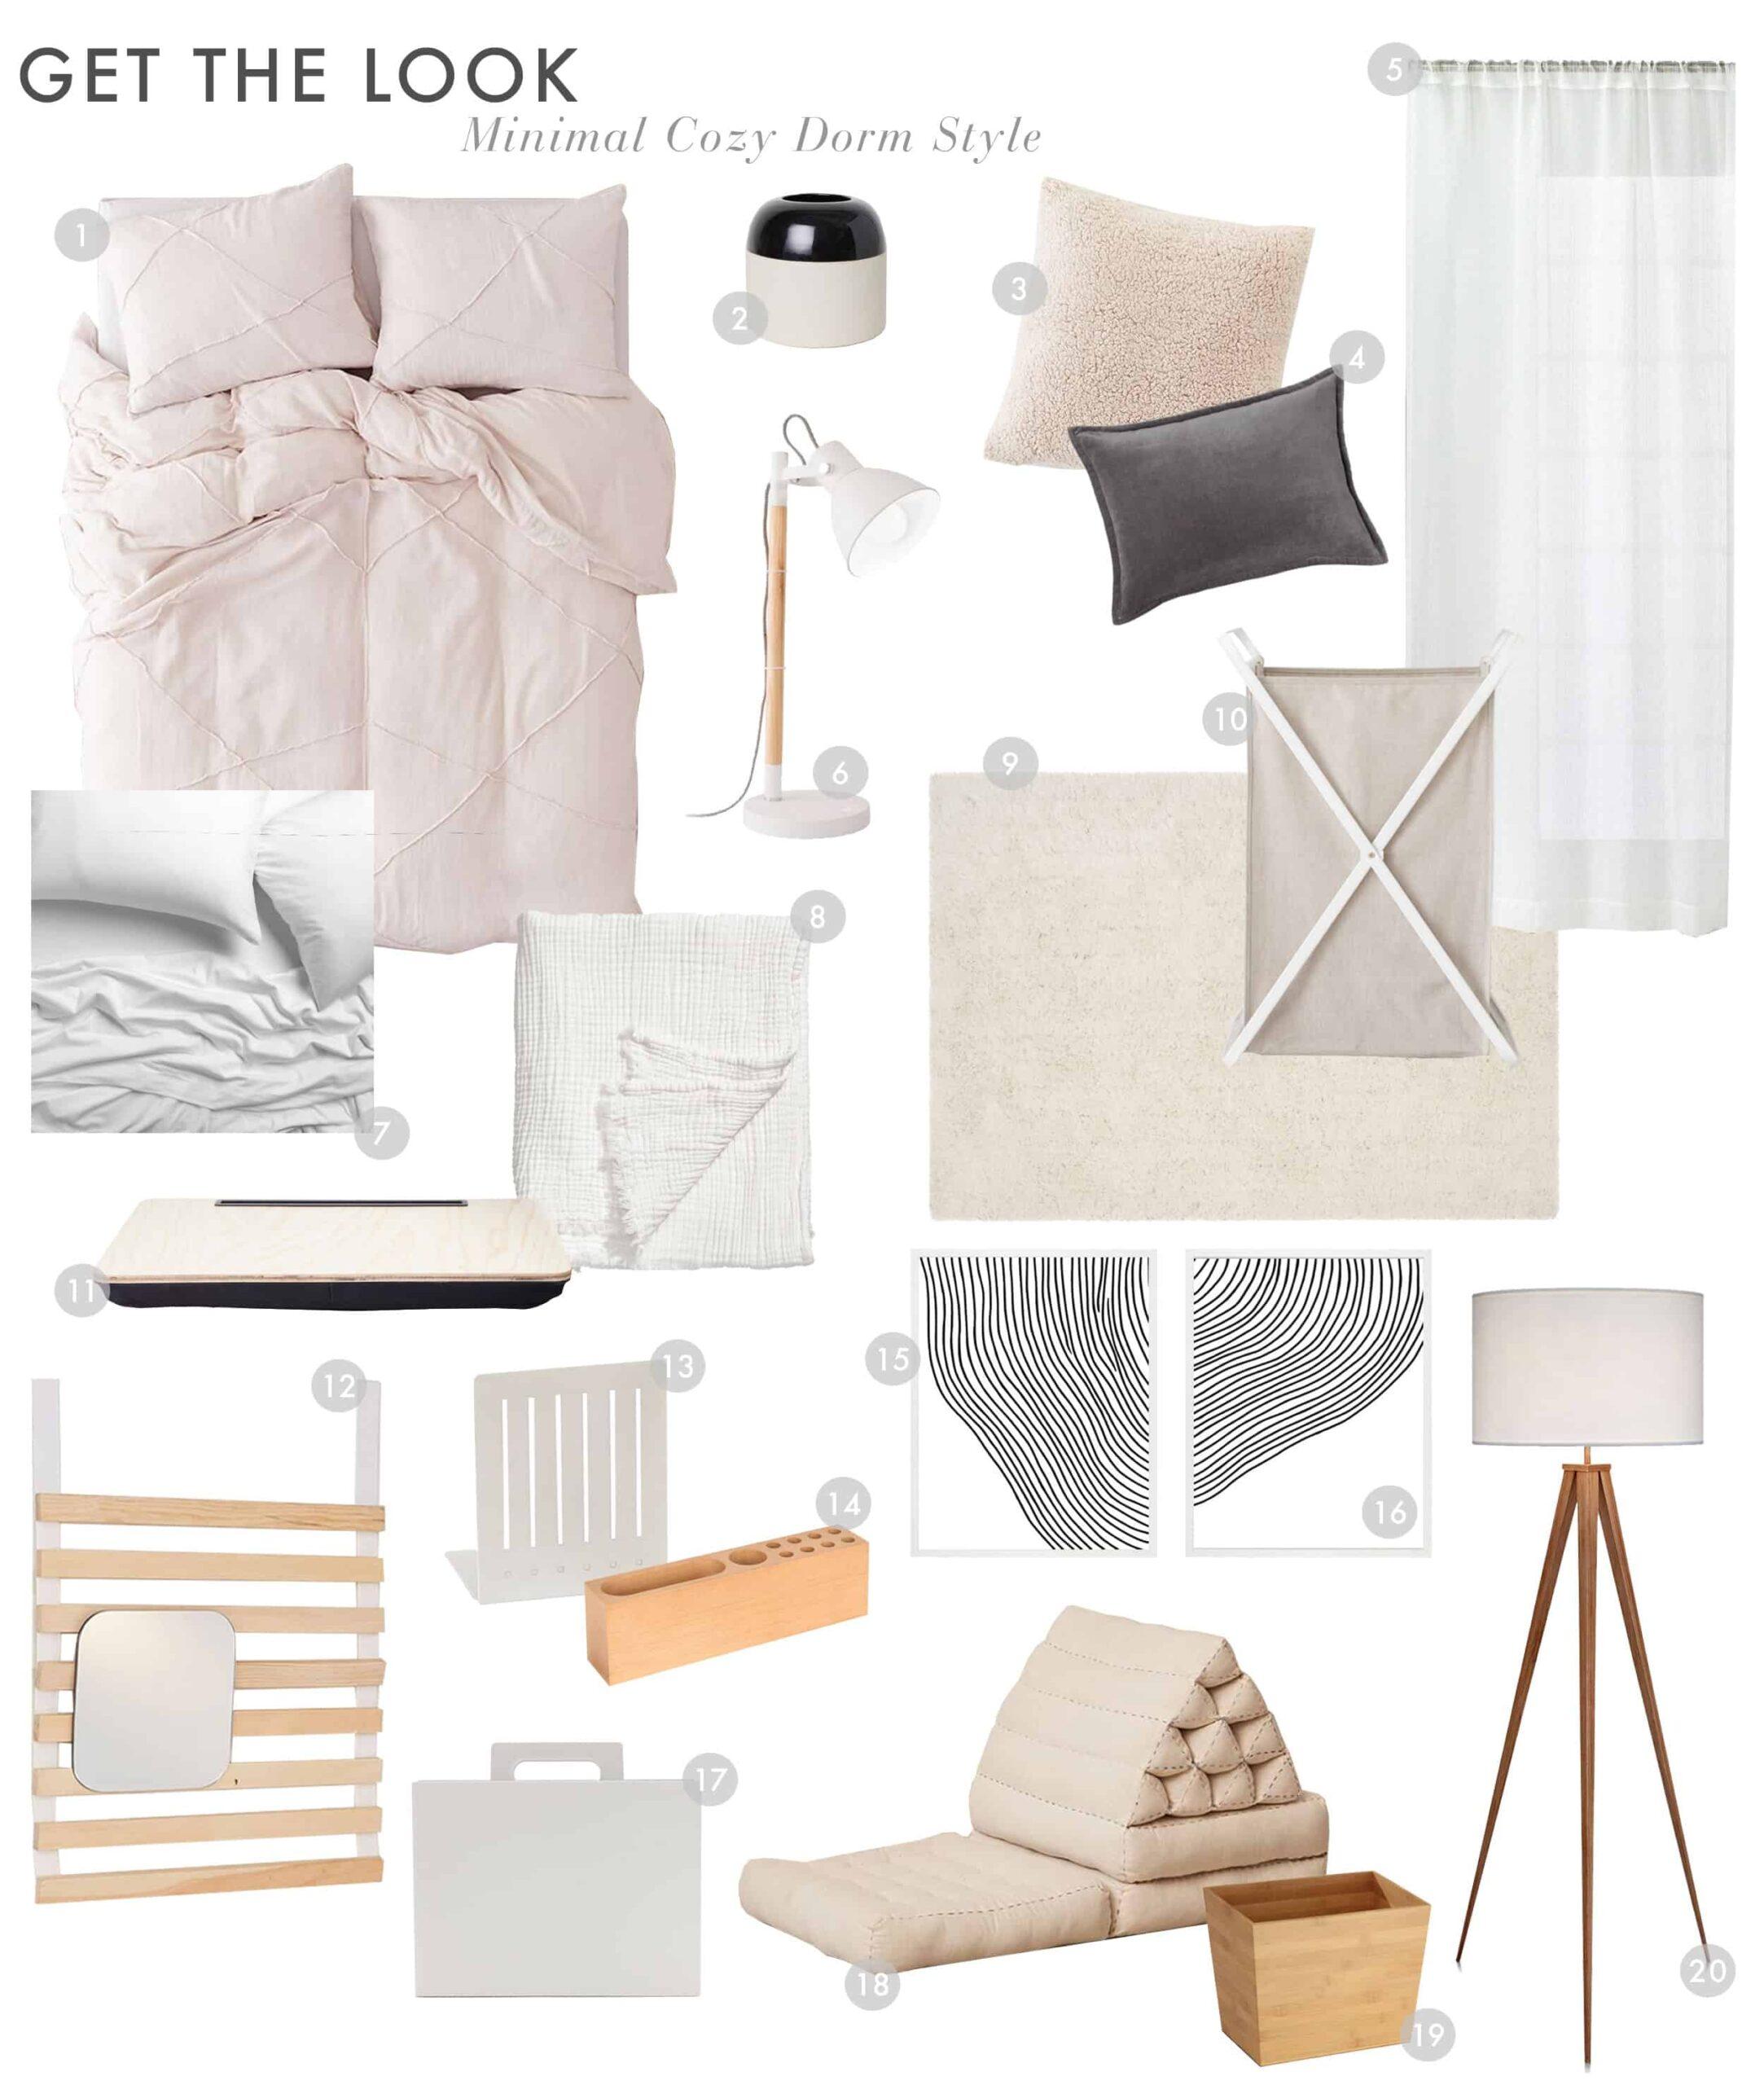 Dorm Room Minimal Cozy1